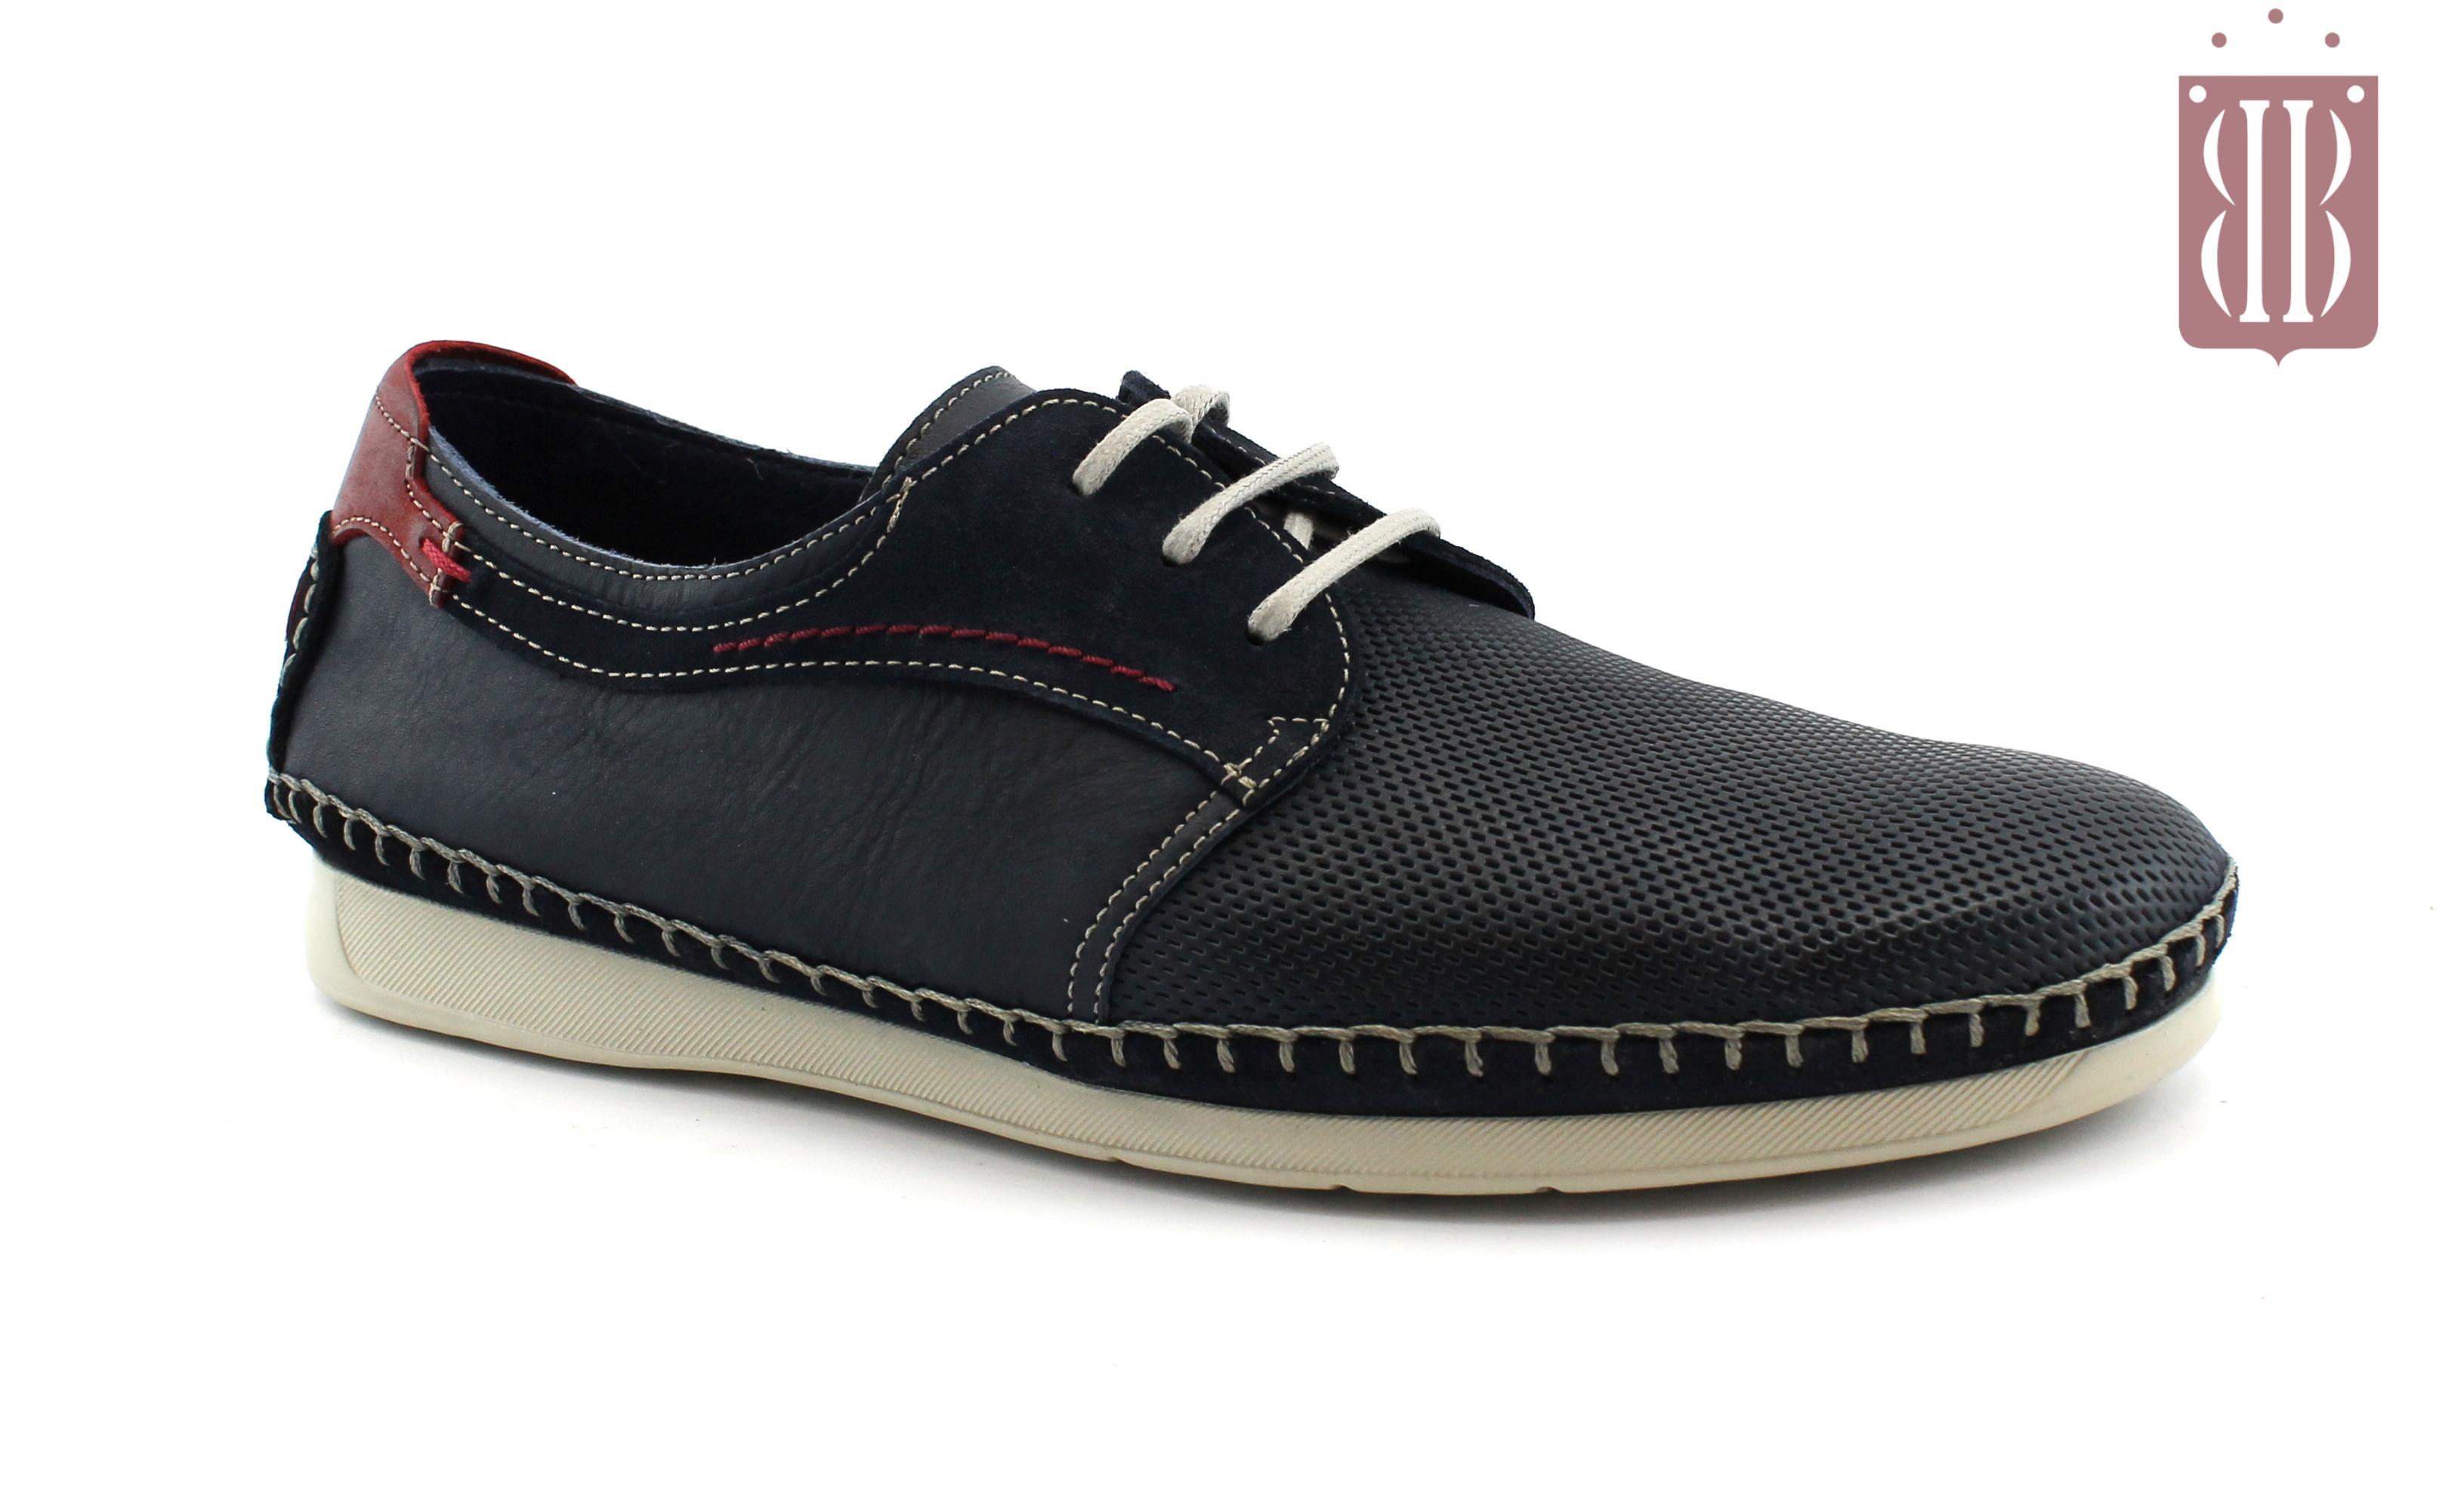 ad727368 FLUCHOS F0199 ocean blu scarpe uomo sneakers pelle lacci forata light